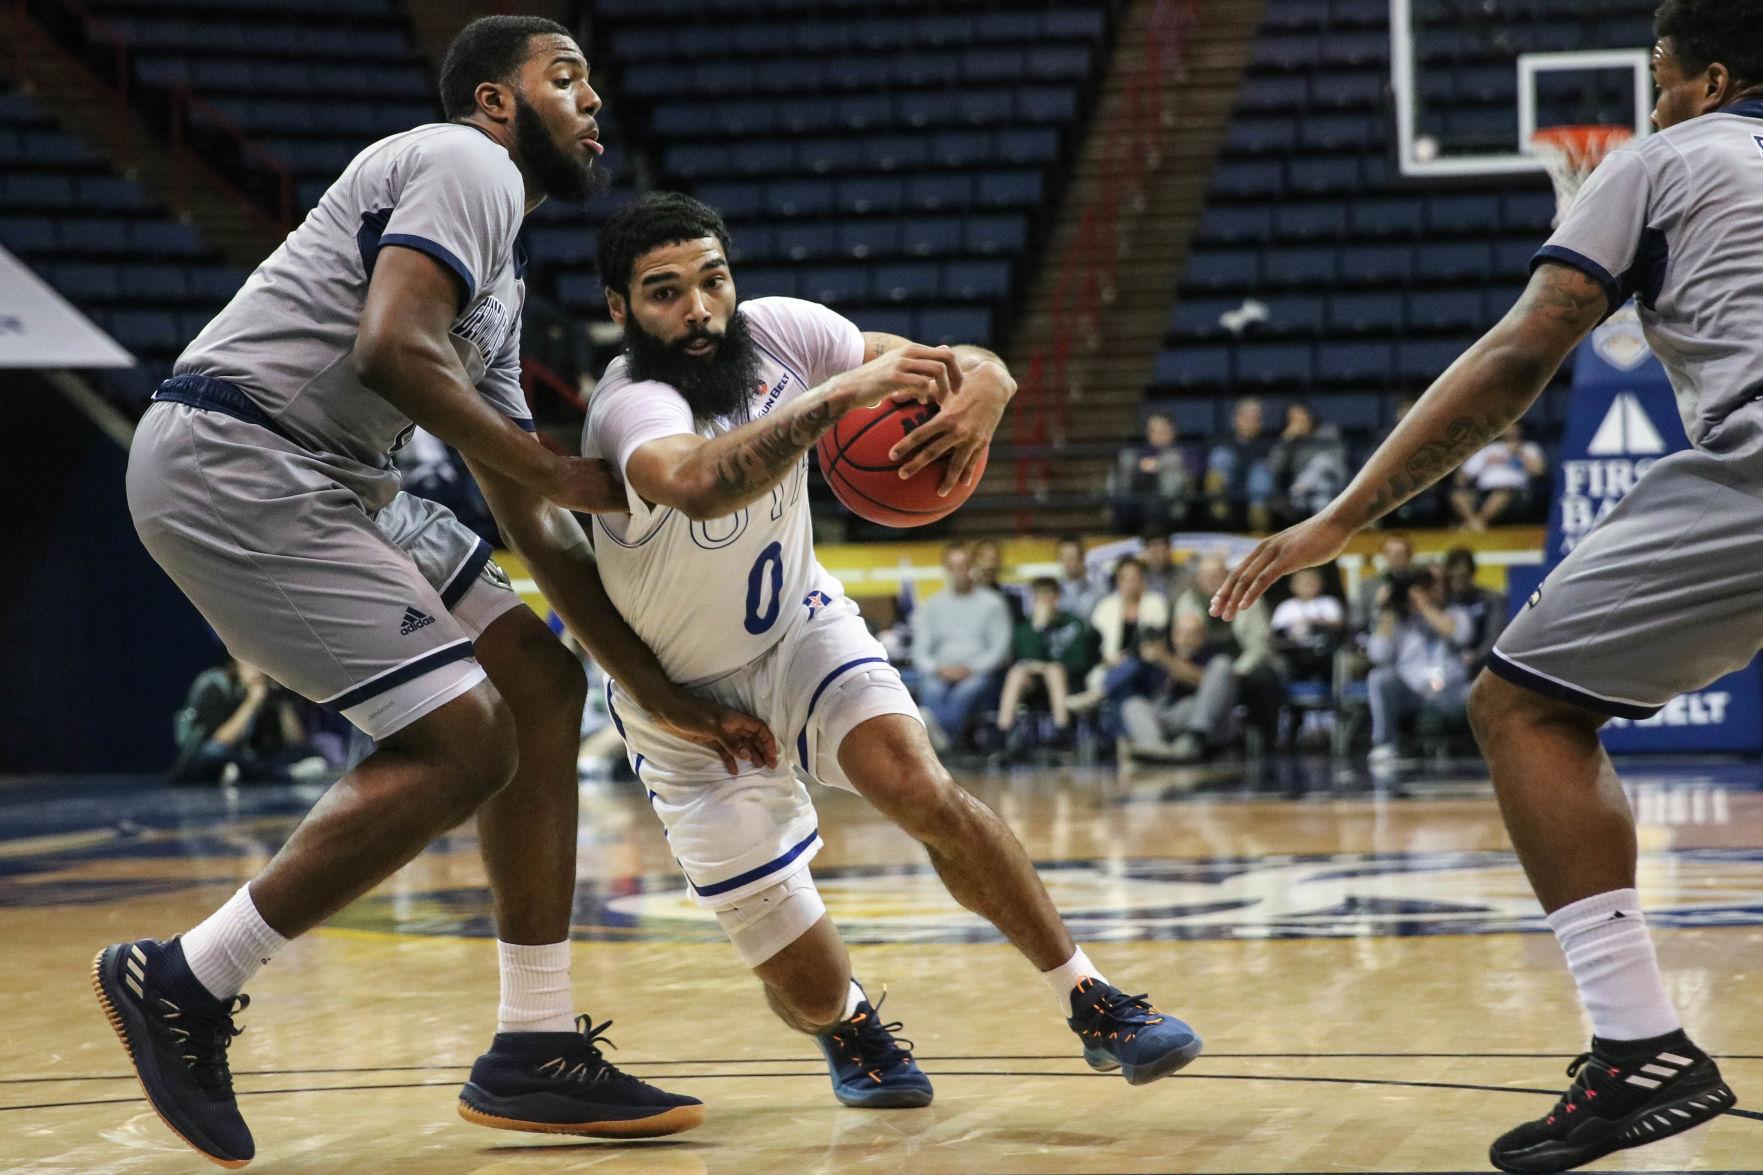 Photos: Mavericks win semifinal bout against Georgia Southern University